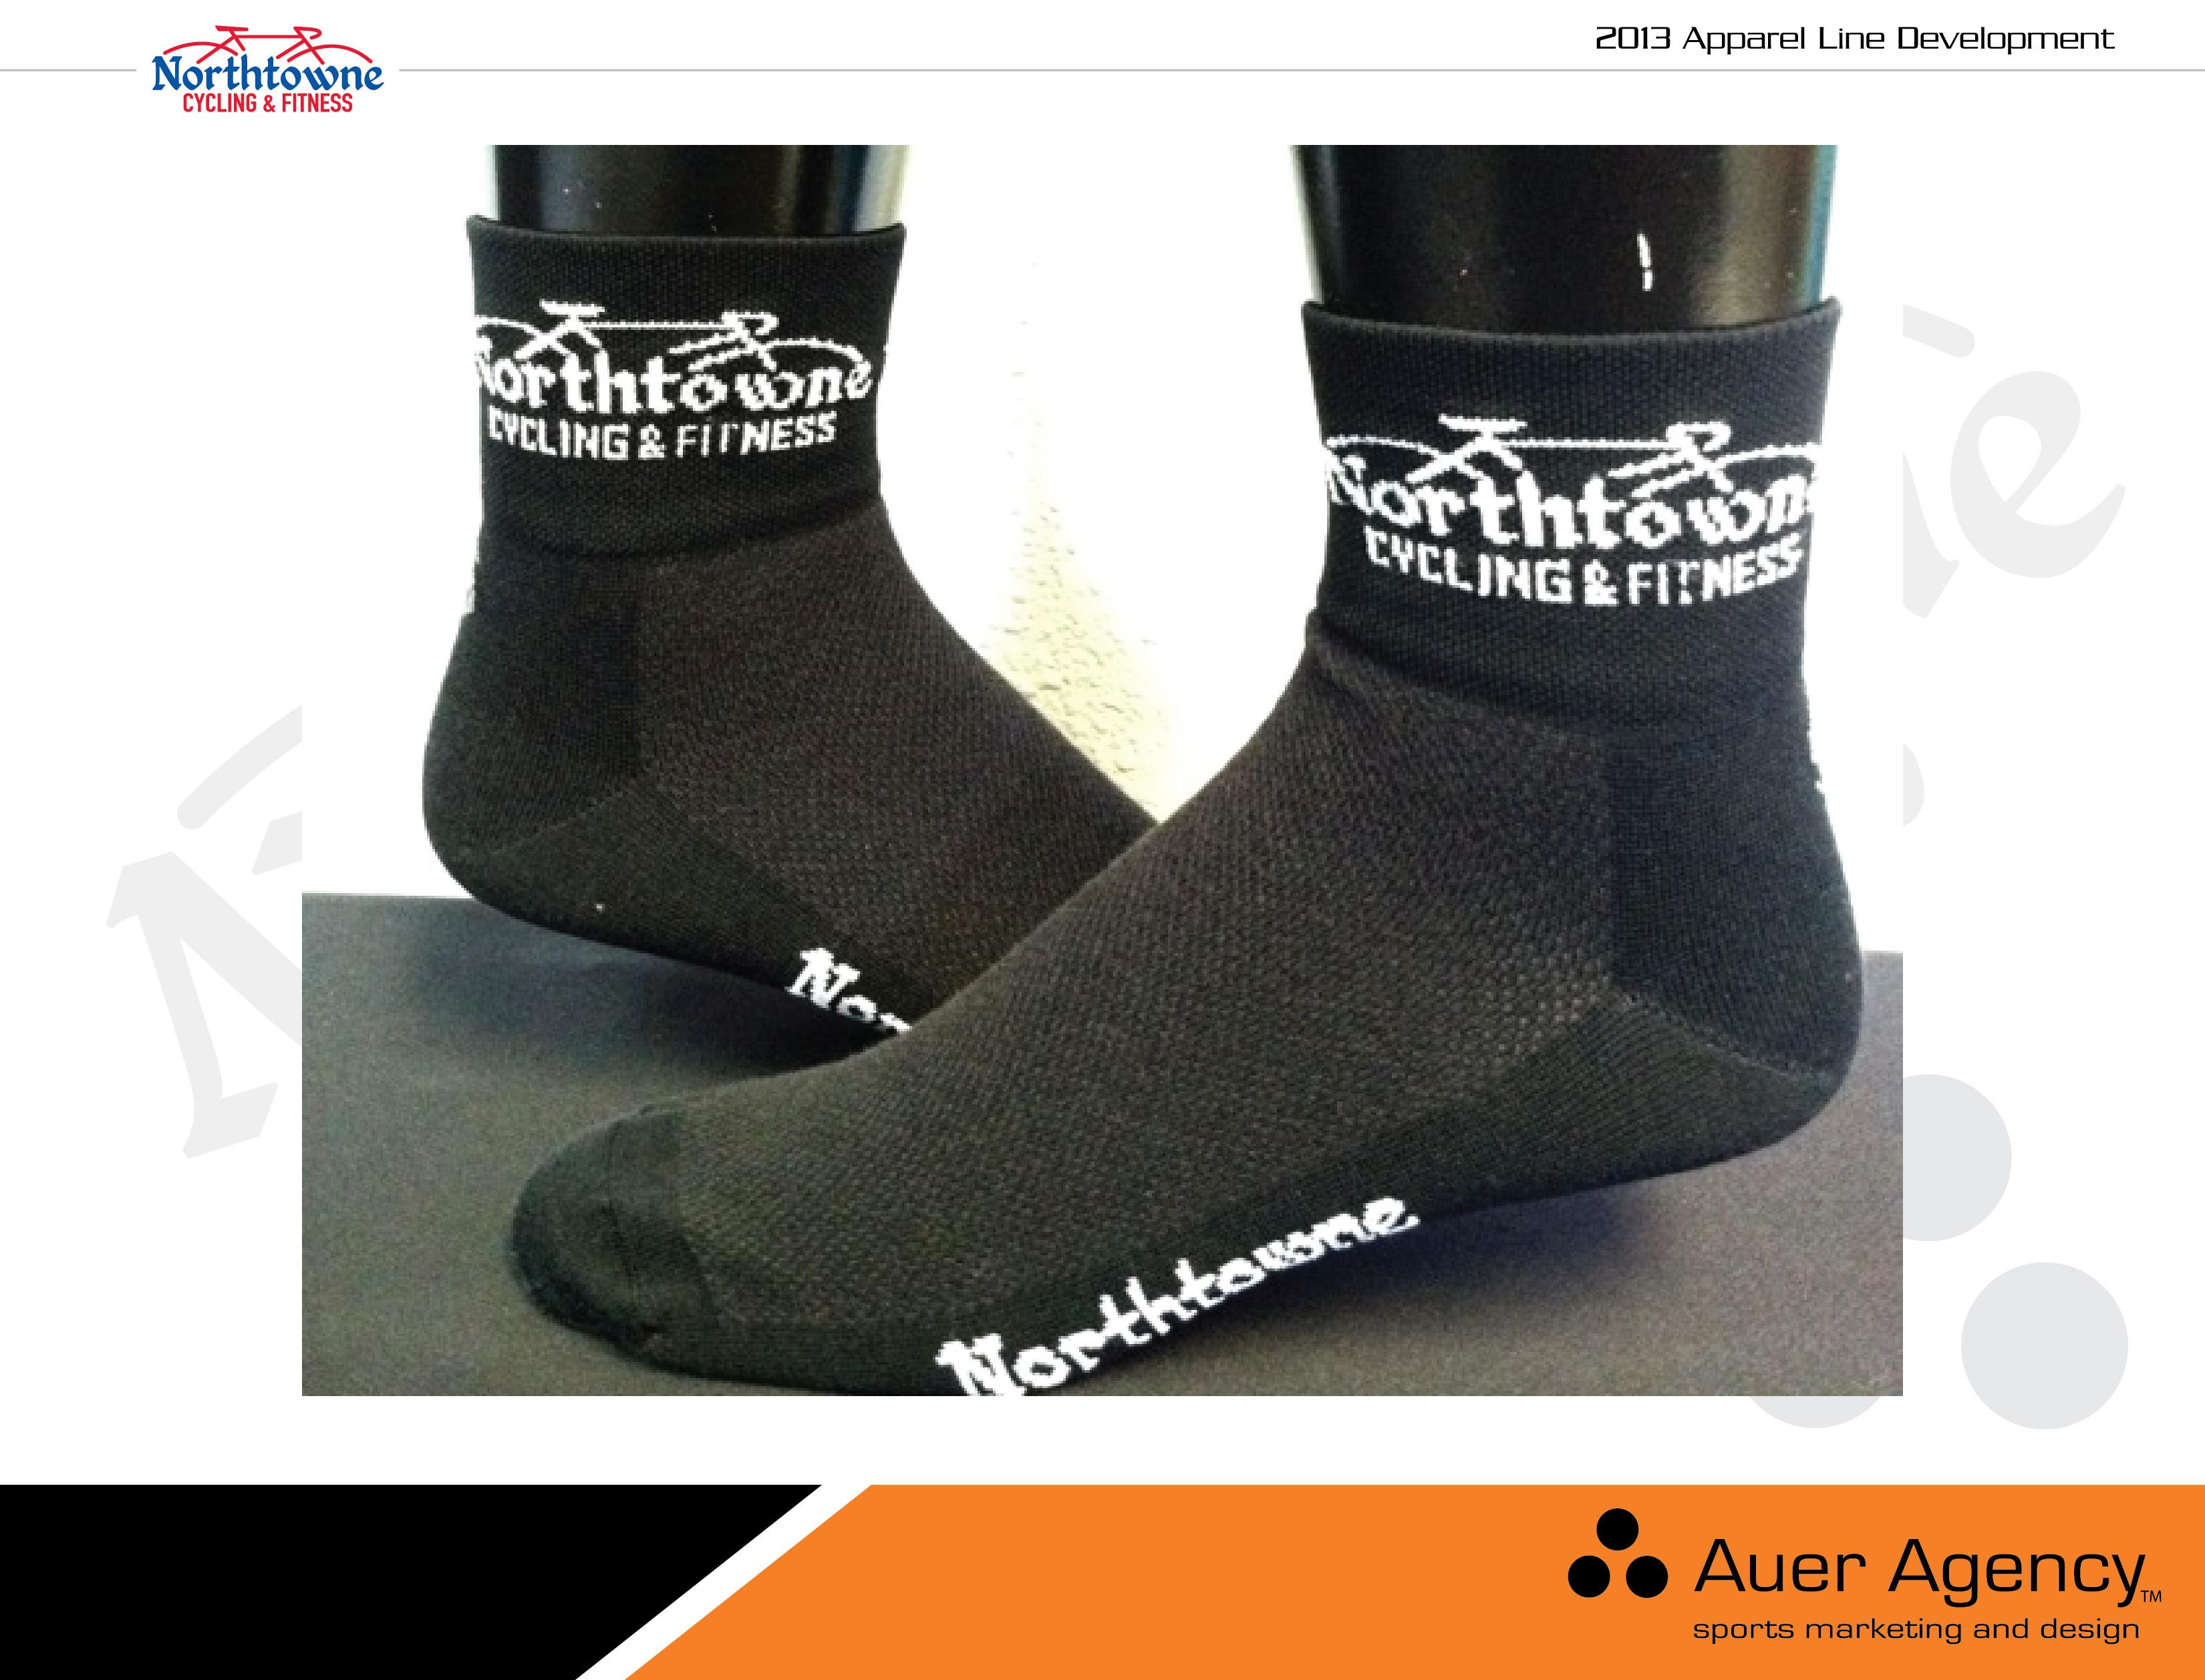 Custom Socks with Northtowne logo knitted into sock. NorthtowneJerseyFInal.  Custom cycling ... cc09f9962